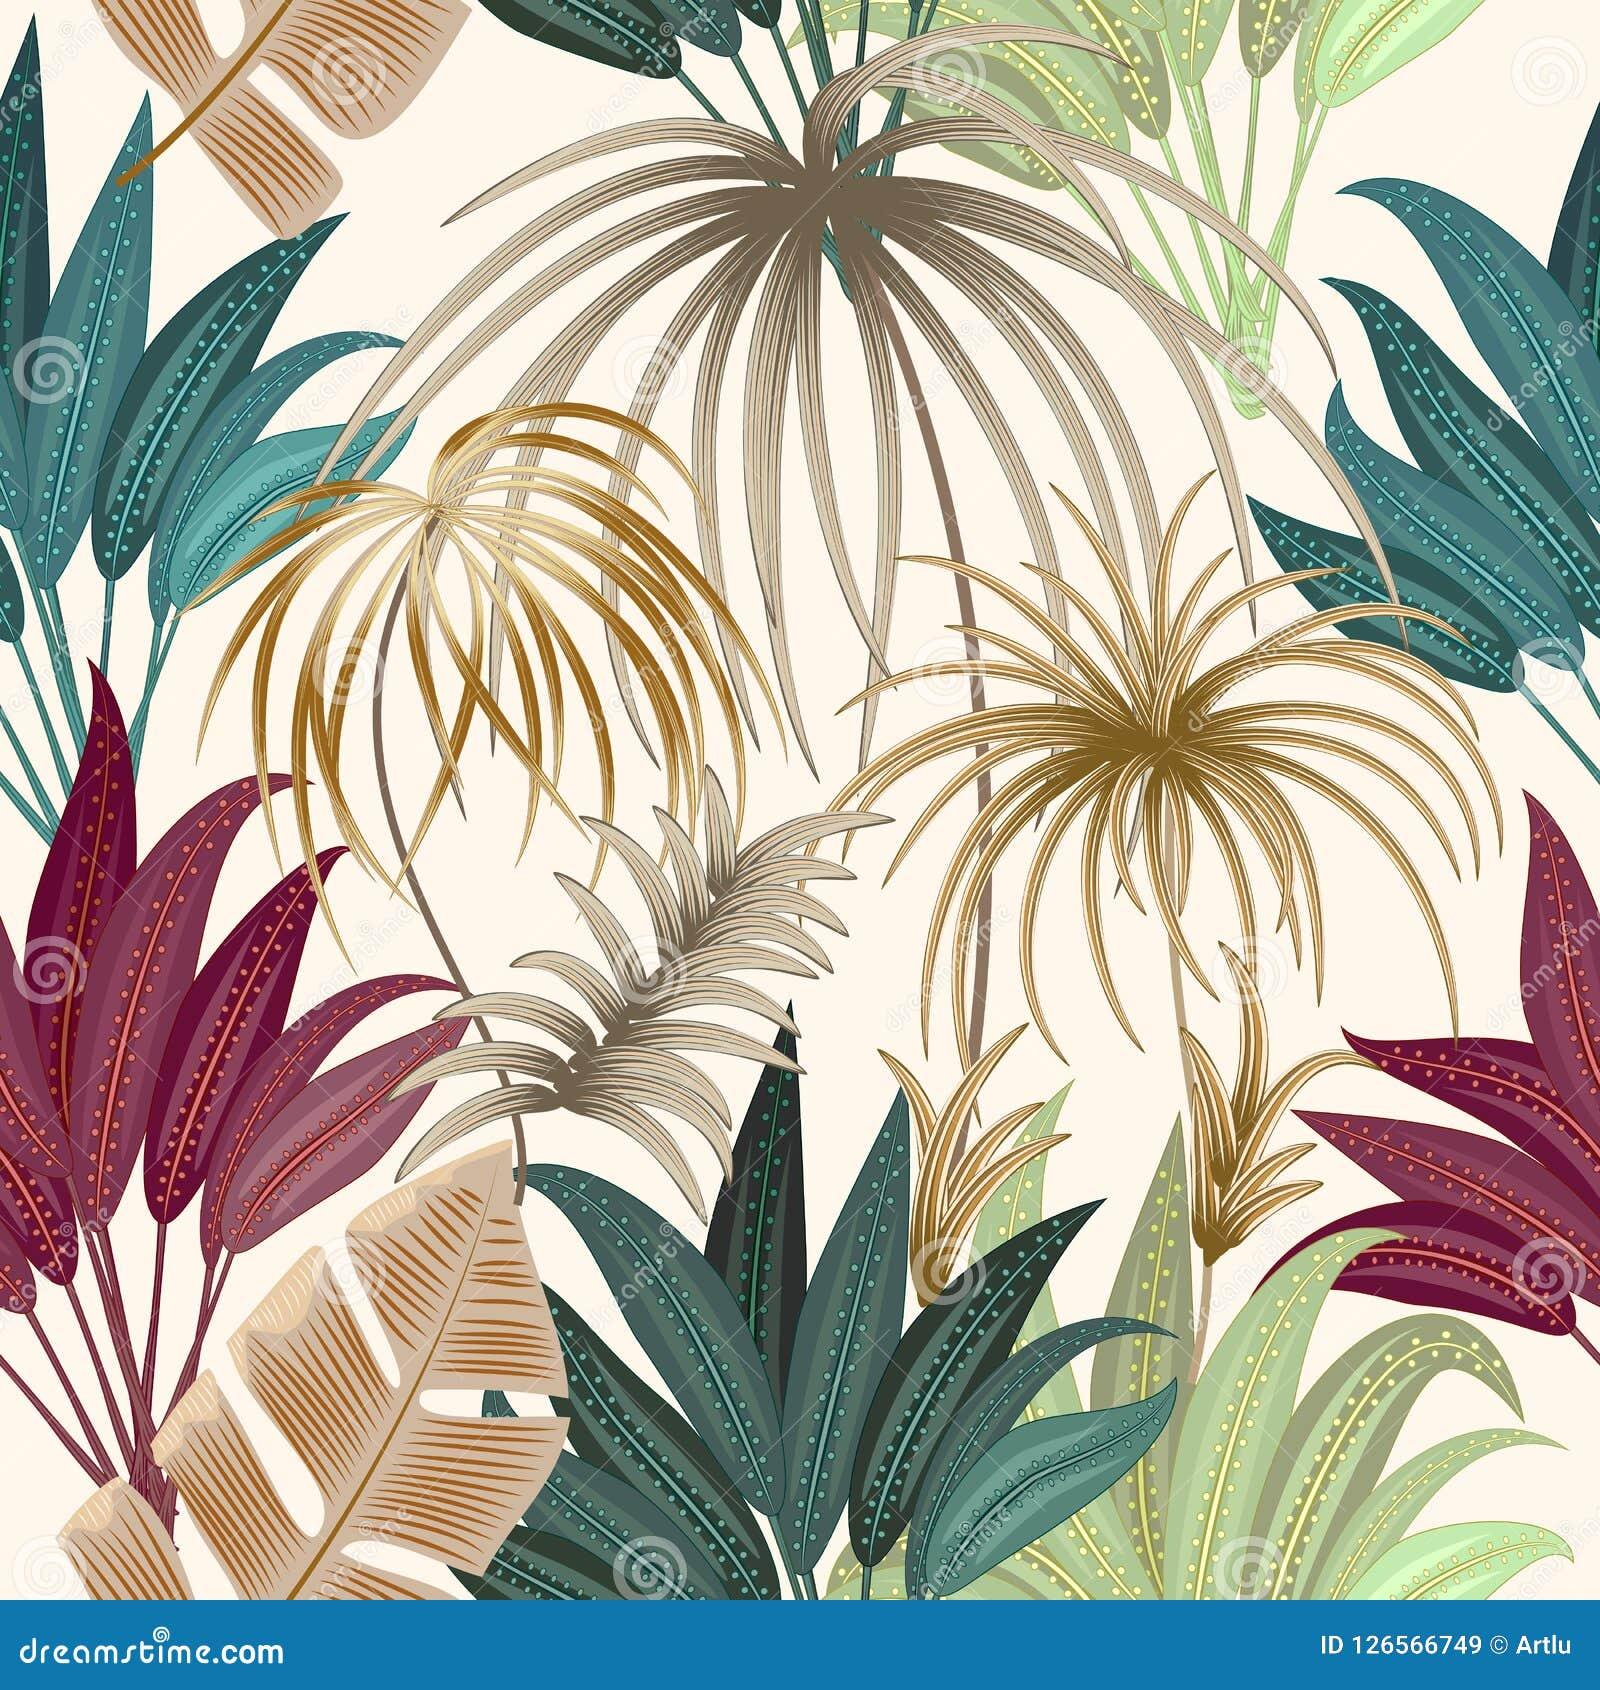 Modelo inconsútil de las hojas de palma tropicales de la planta exótica de la selva, la Florida